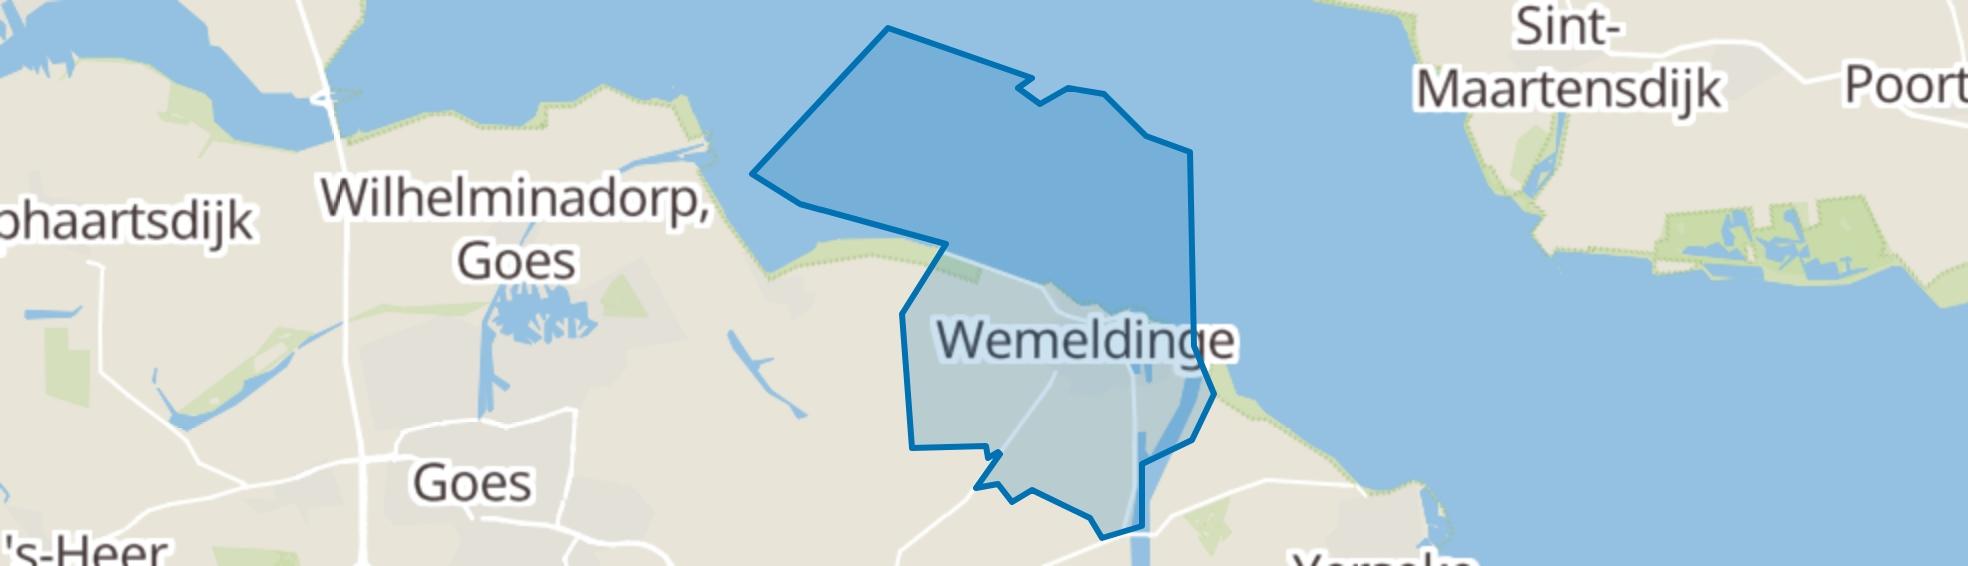 Wemeldinge map